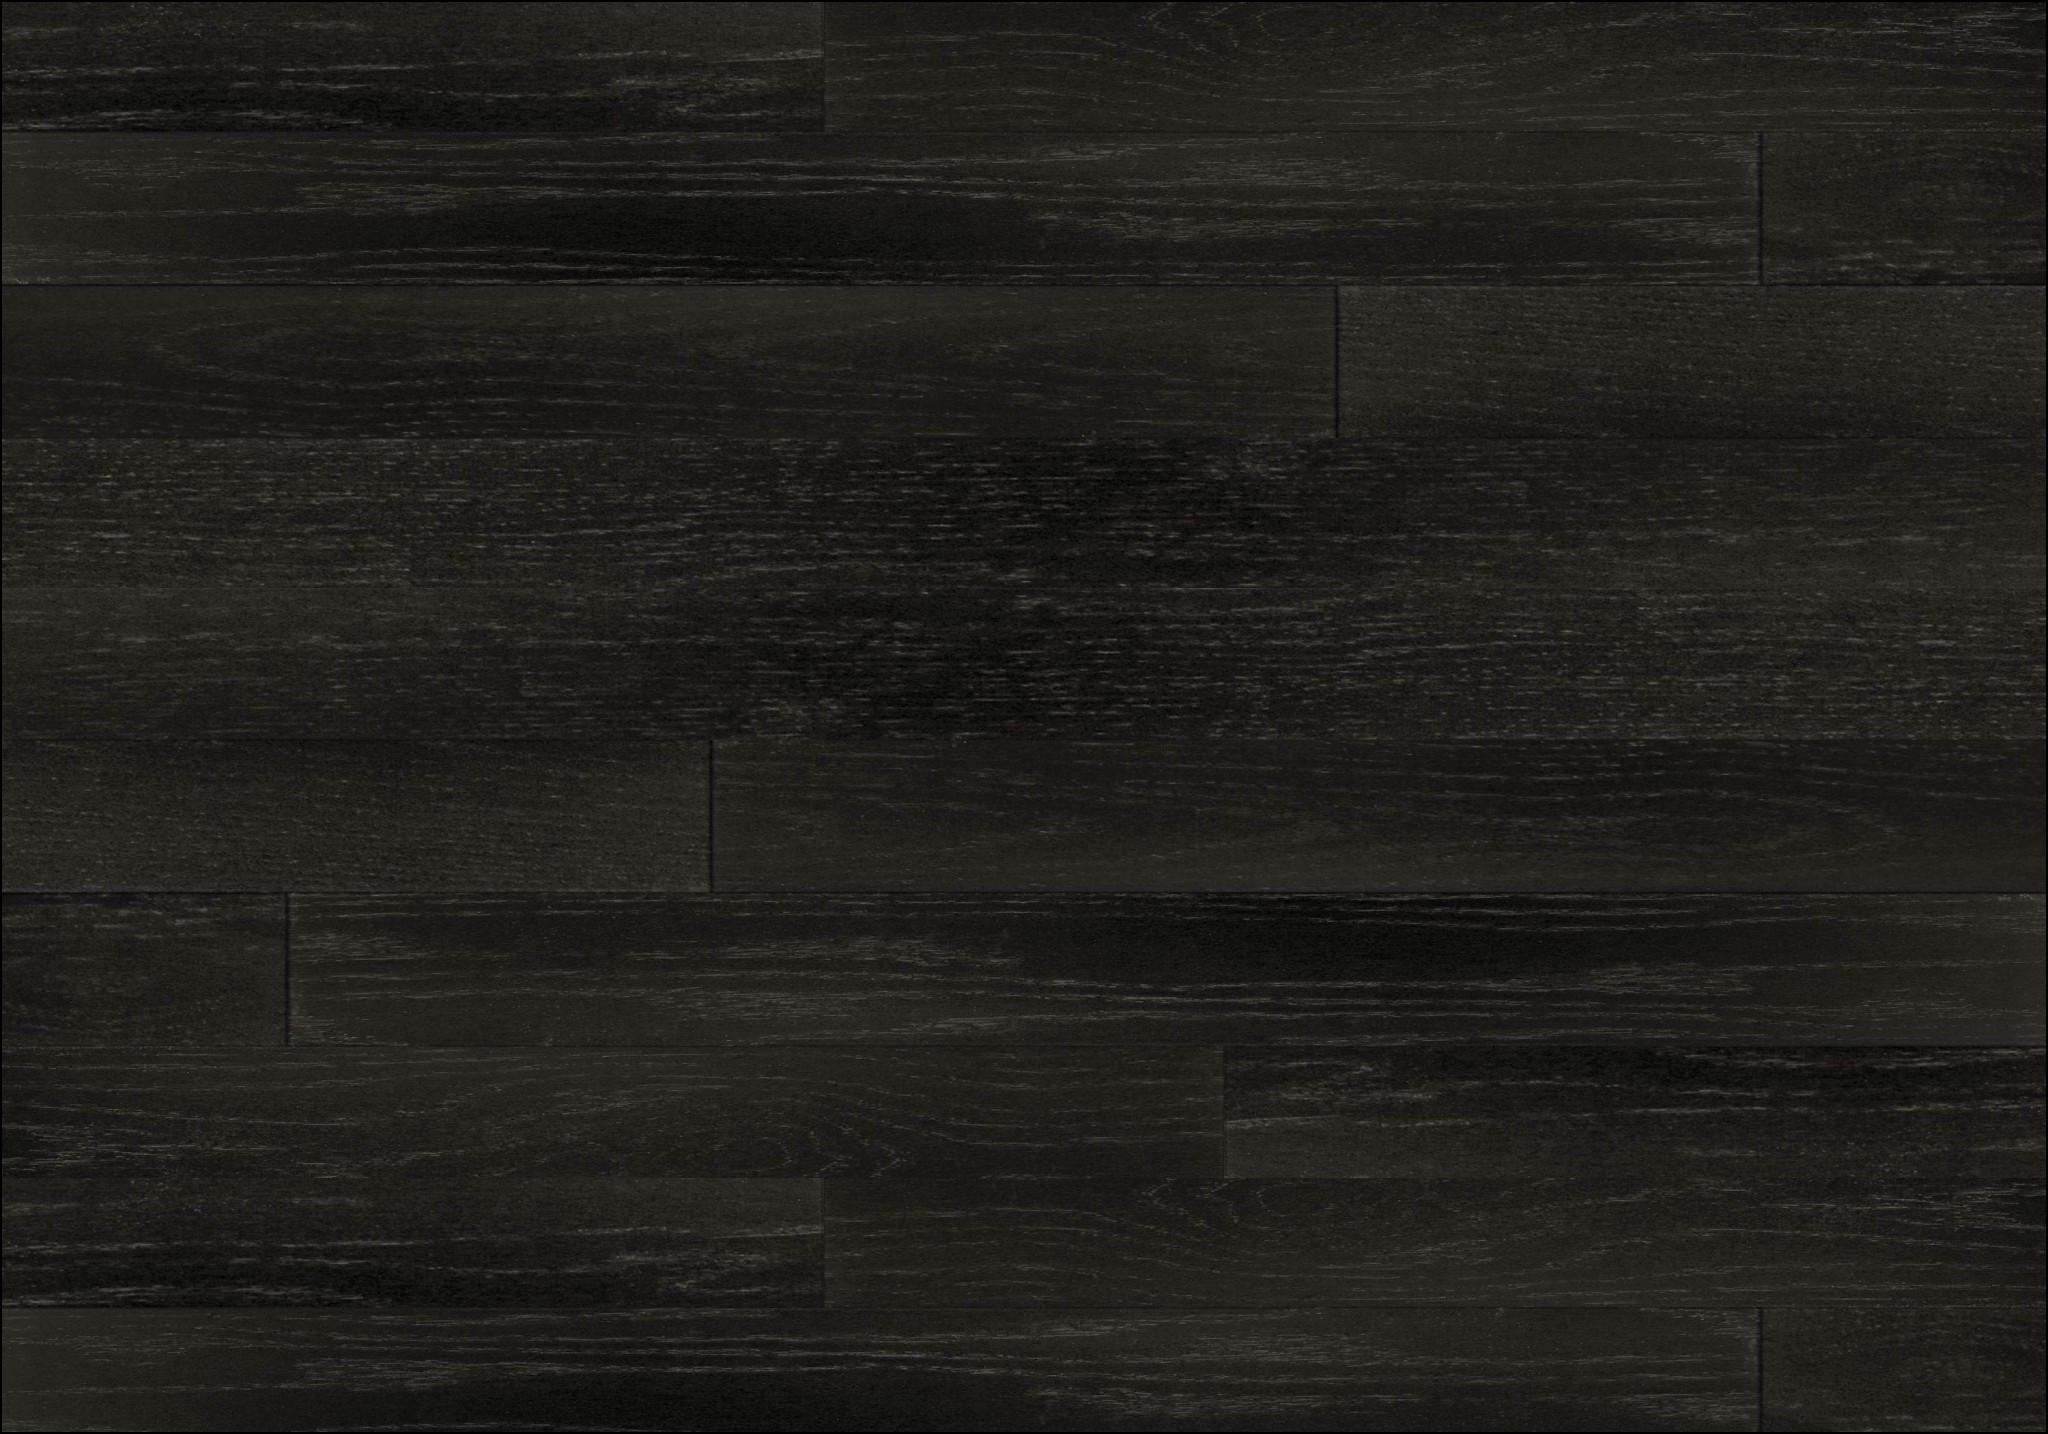 hardwood floor refinishing huntington wv of hardwood flooring suppliers france flooring ideas for hardwood flooring cost for 1000 square feet stock articles rippnfinish hardwood floor refinishing of hardwood